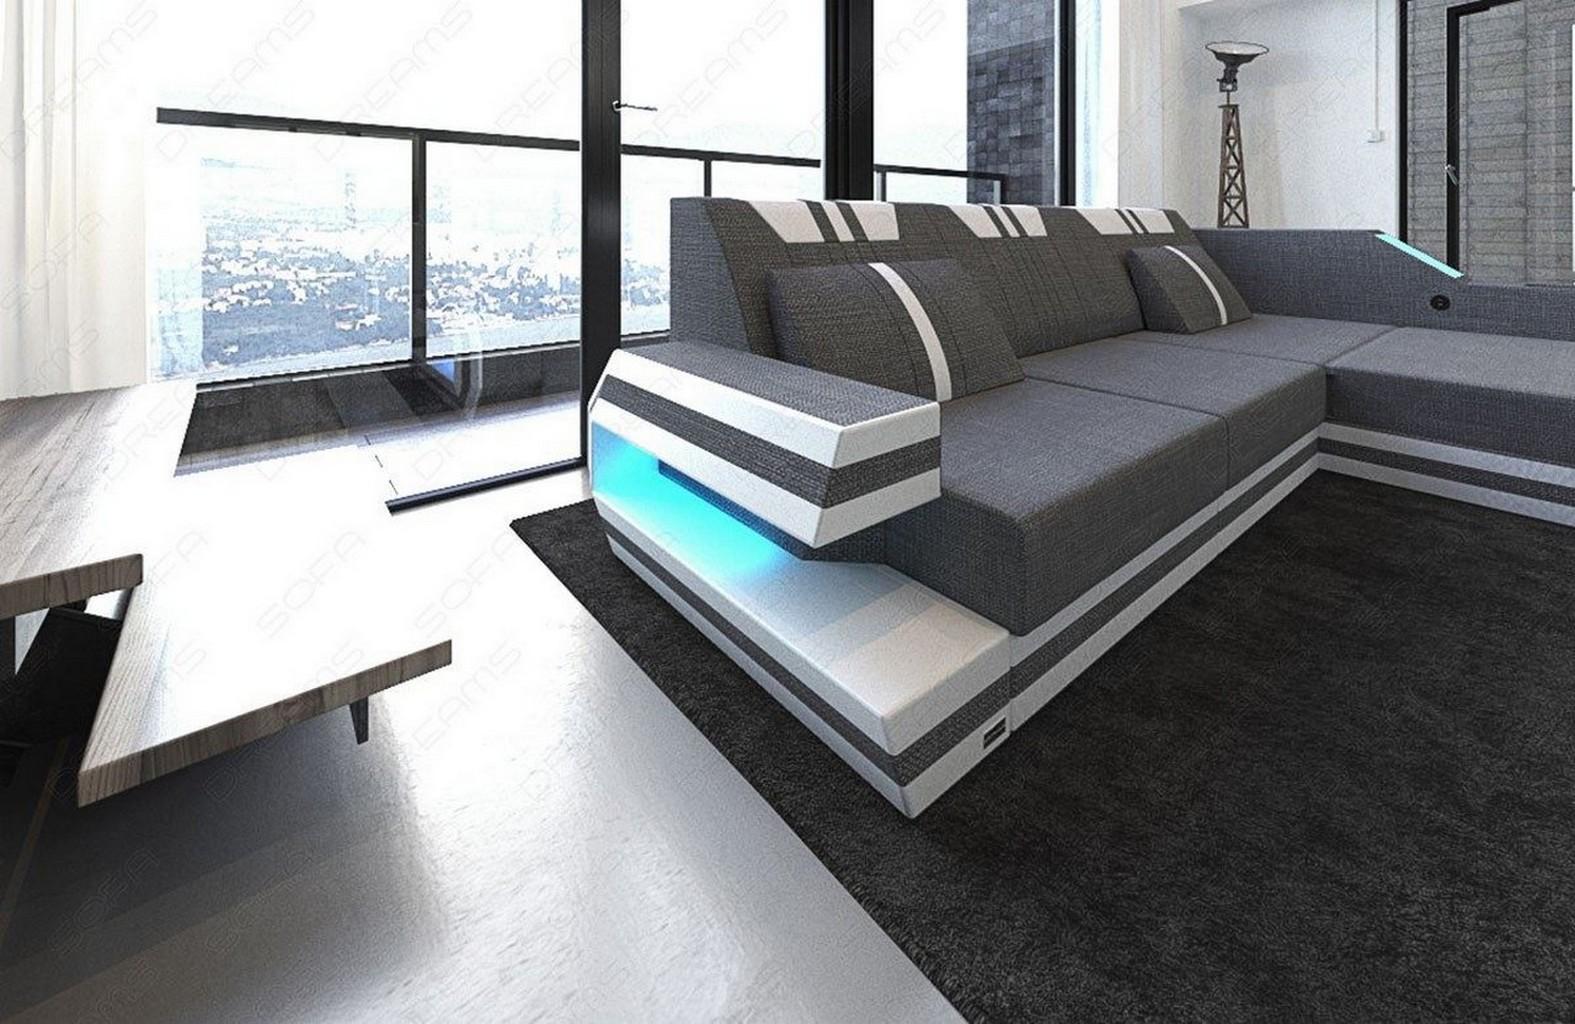 luxus sofa ravenna l grauecksofa mit led beleuchtung und usb im materialmix ebay. Black Bedroom Furniture Sets. Home Design Ideas